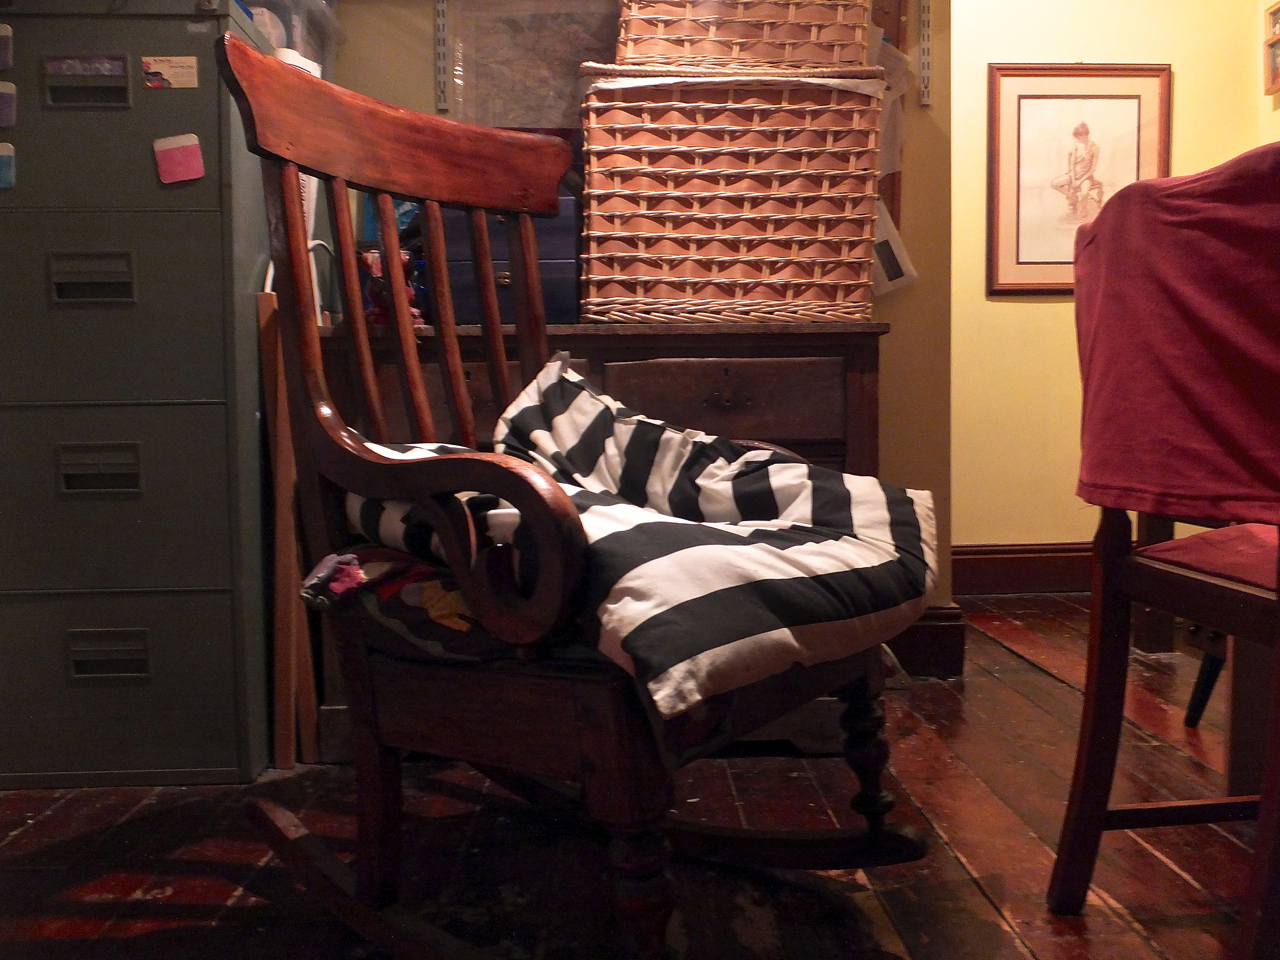 Rocking chair, 18/3/14